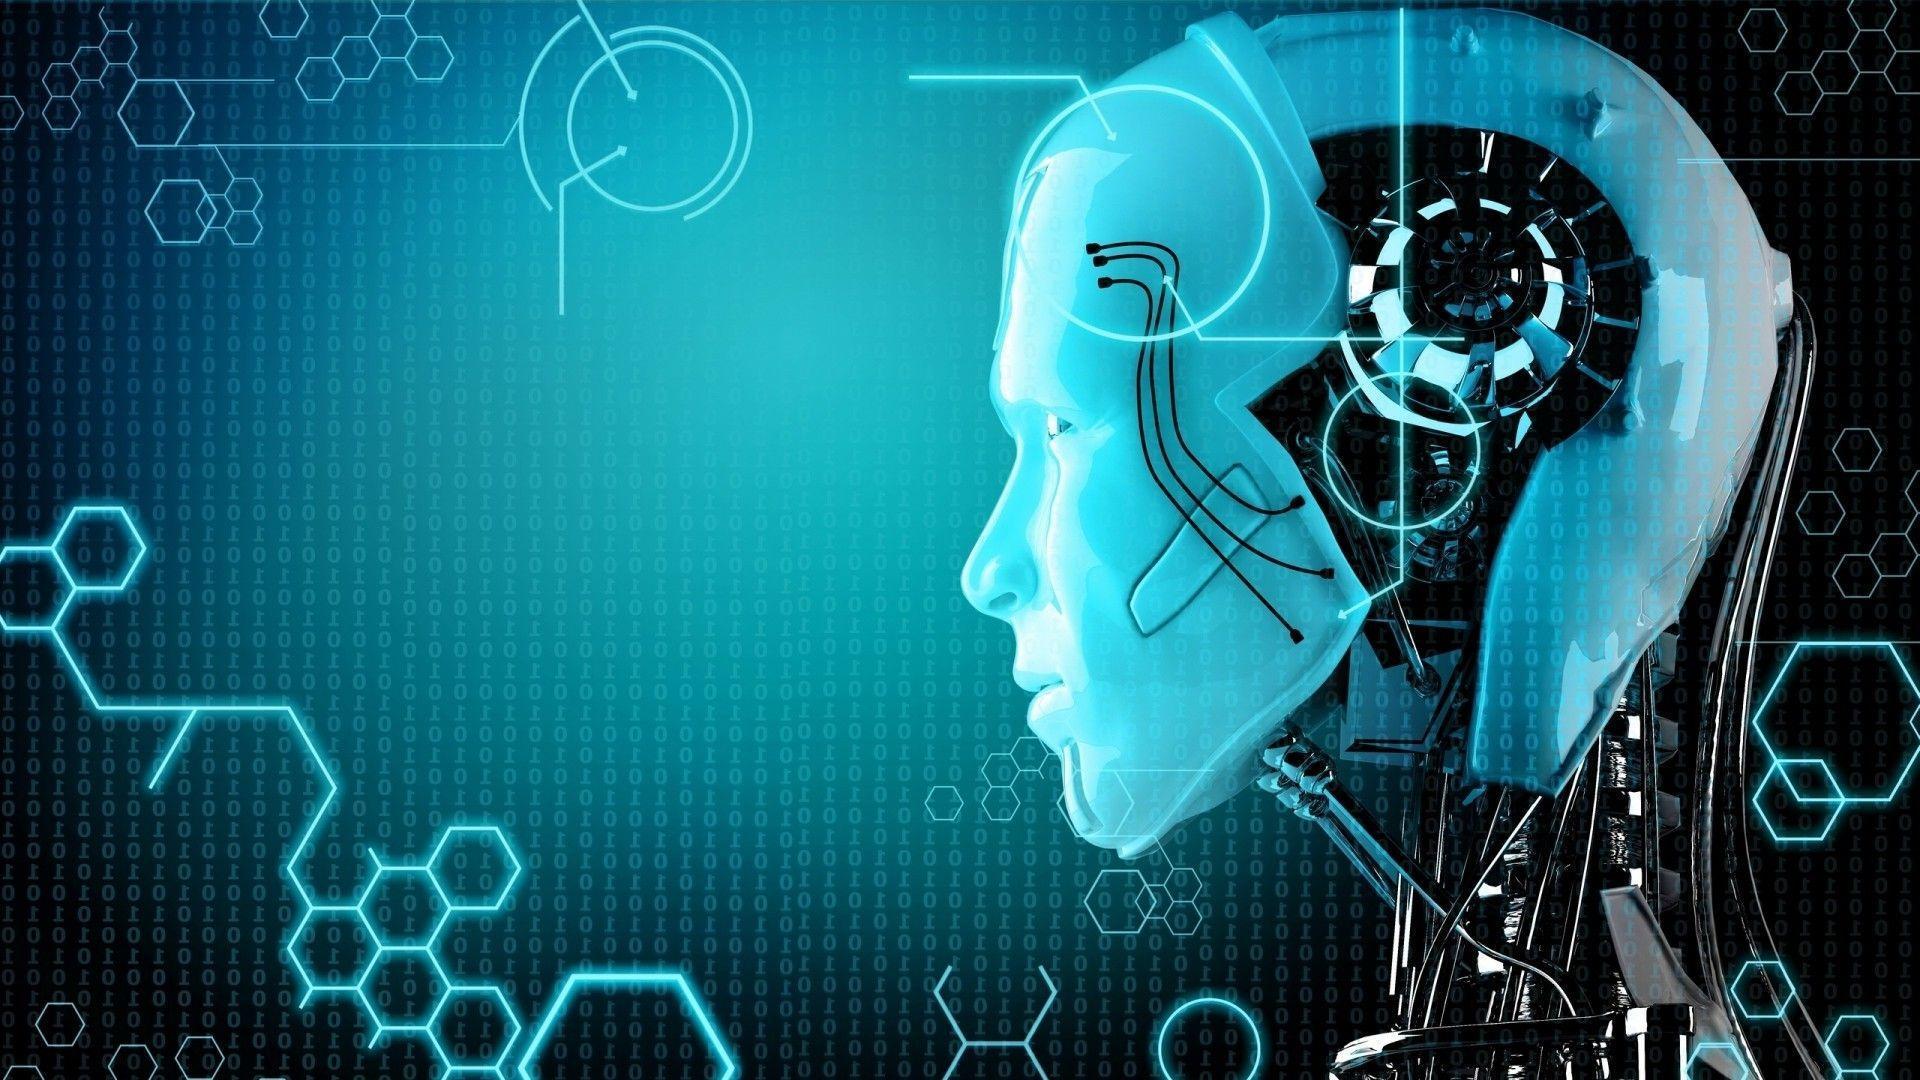 Download HD face, Portrait, Digital Art, Robot, Artificial .